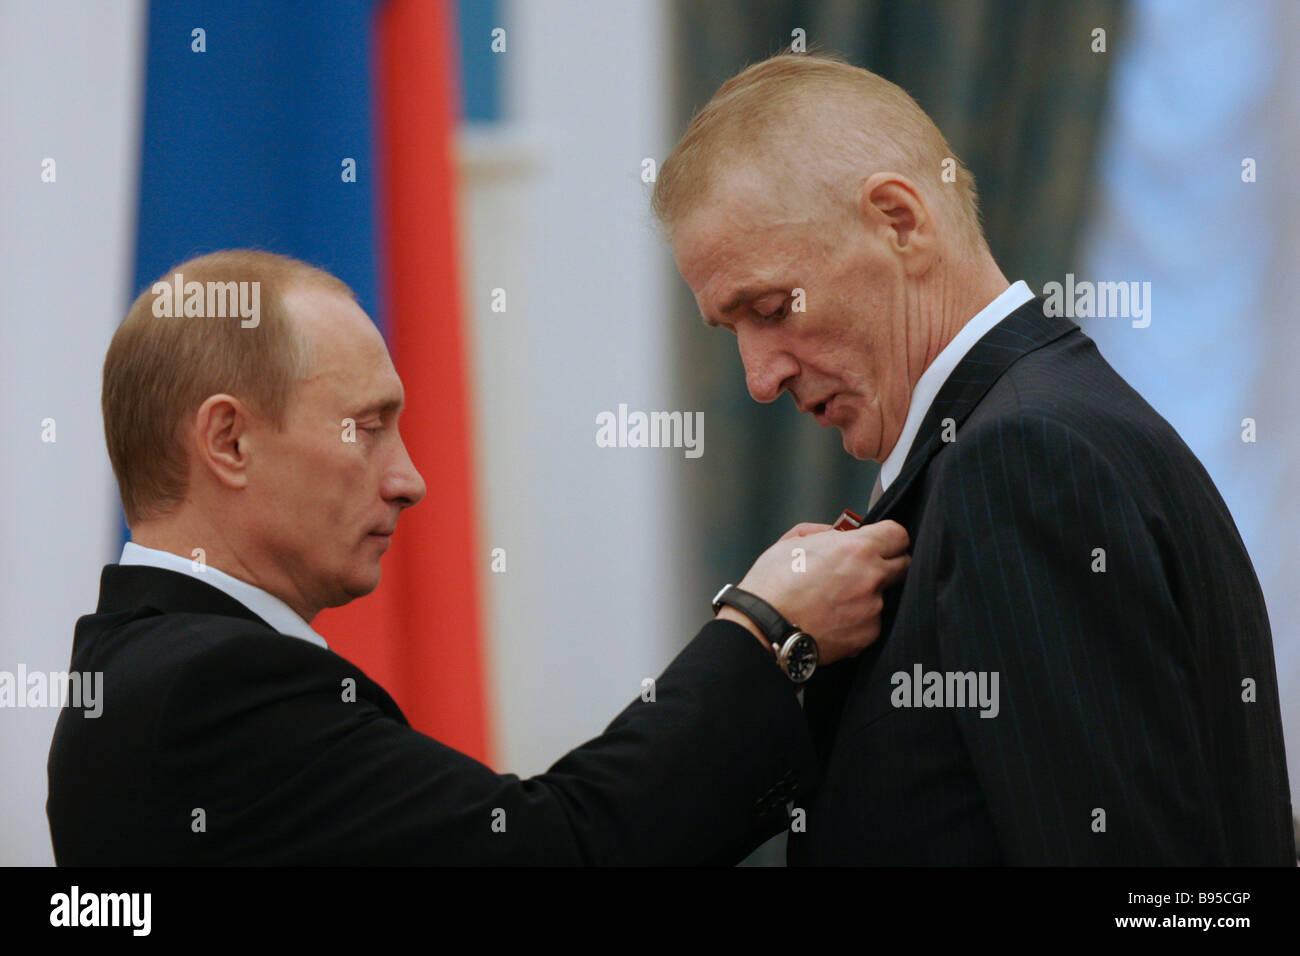 Russian President Vladimir Putin left awarding Alexander Abdulov actor of the Lenkom Theater the Order For Services - Stock Image